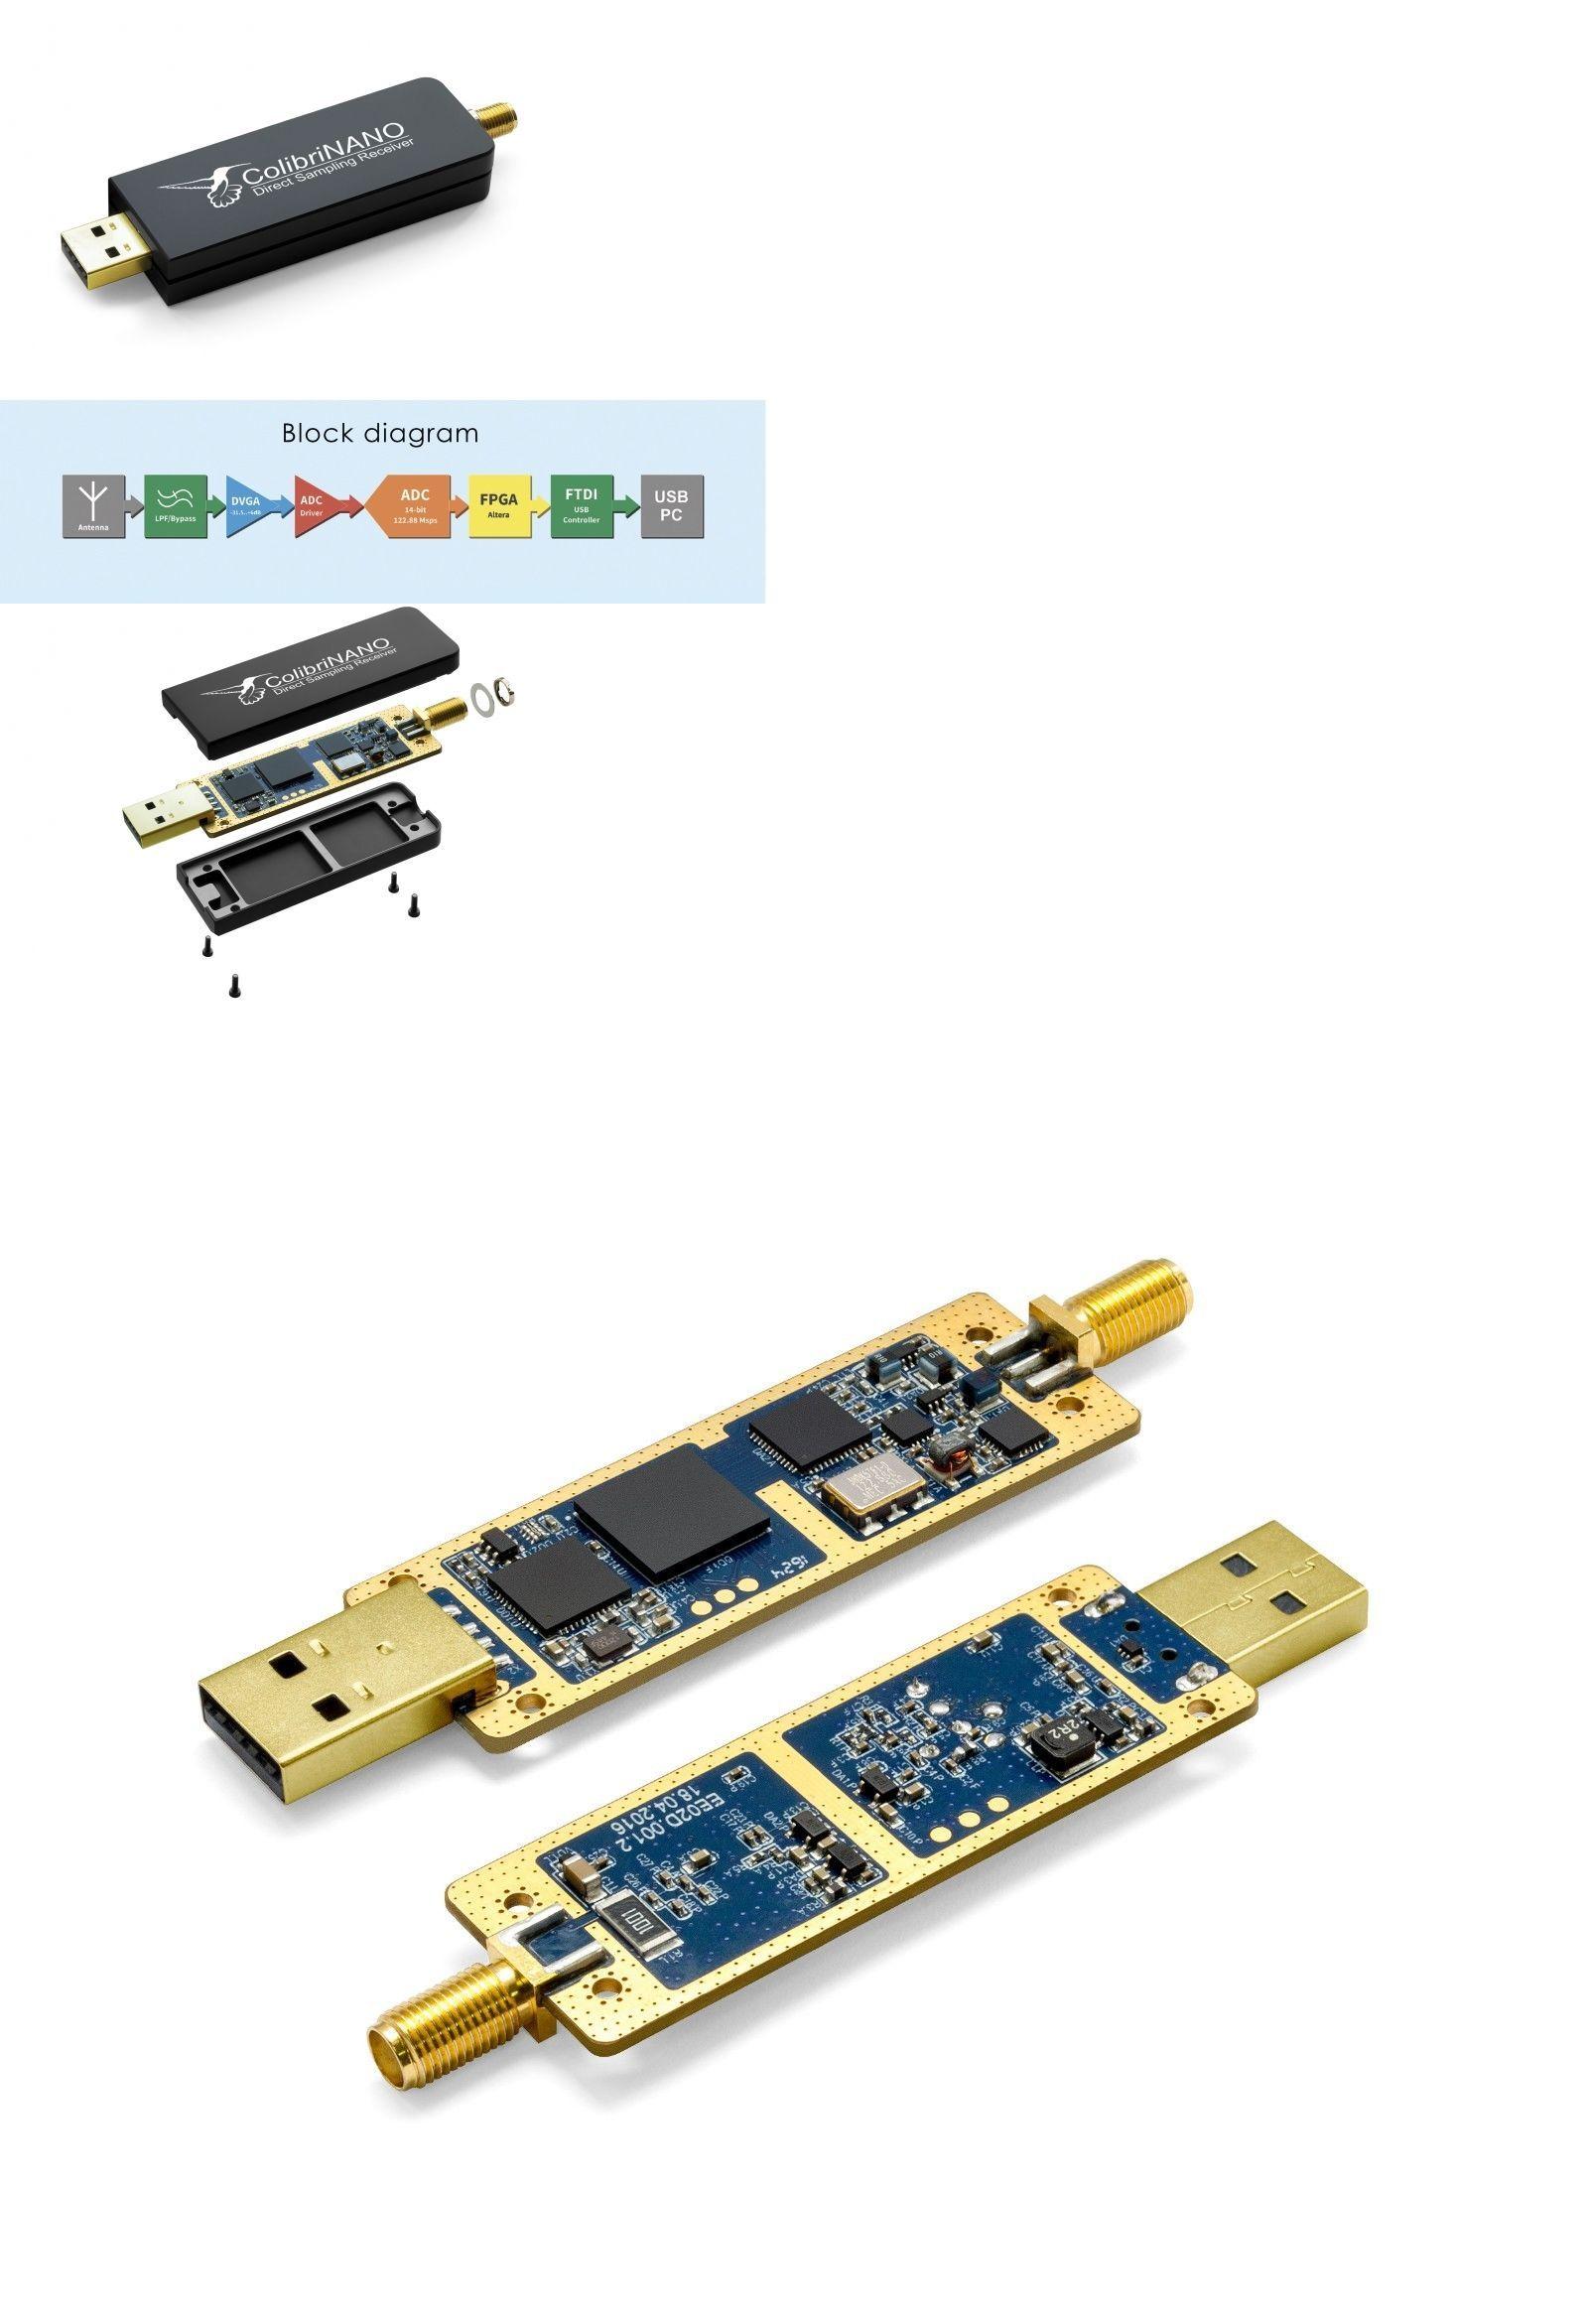 Ham Radio Receivers New Expert Electronics Colibrinano Sdr Receiver 0 01 500mhz 14bit Adc Pre Order Buy It Now Only 249 95 On Ebay Ham Radio Radio Ebay